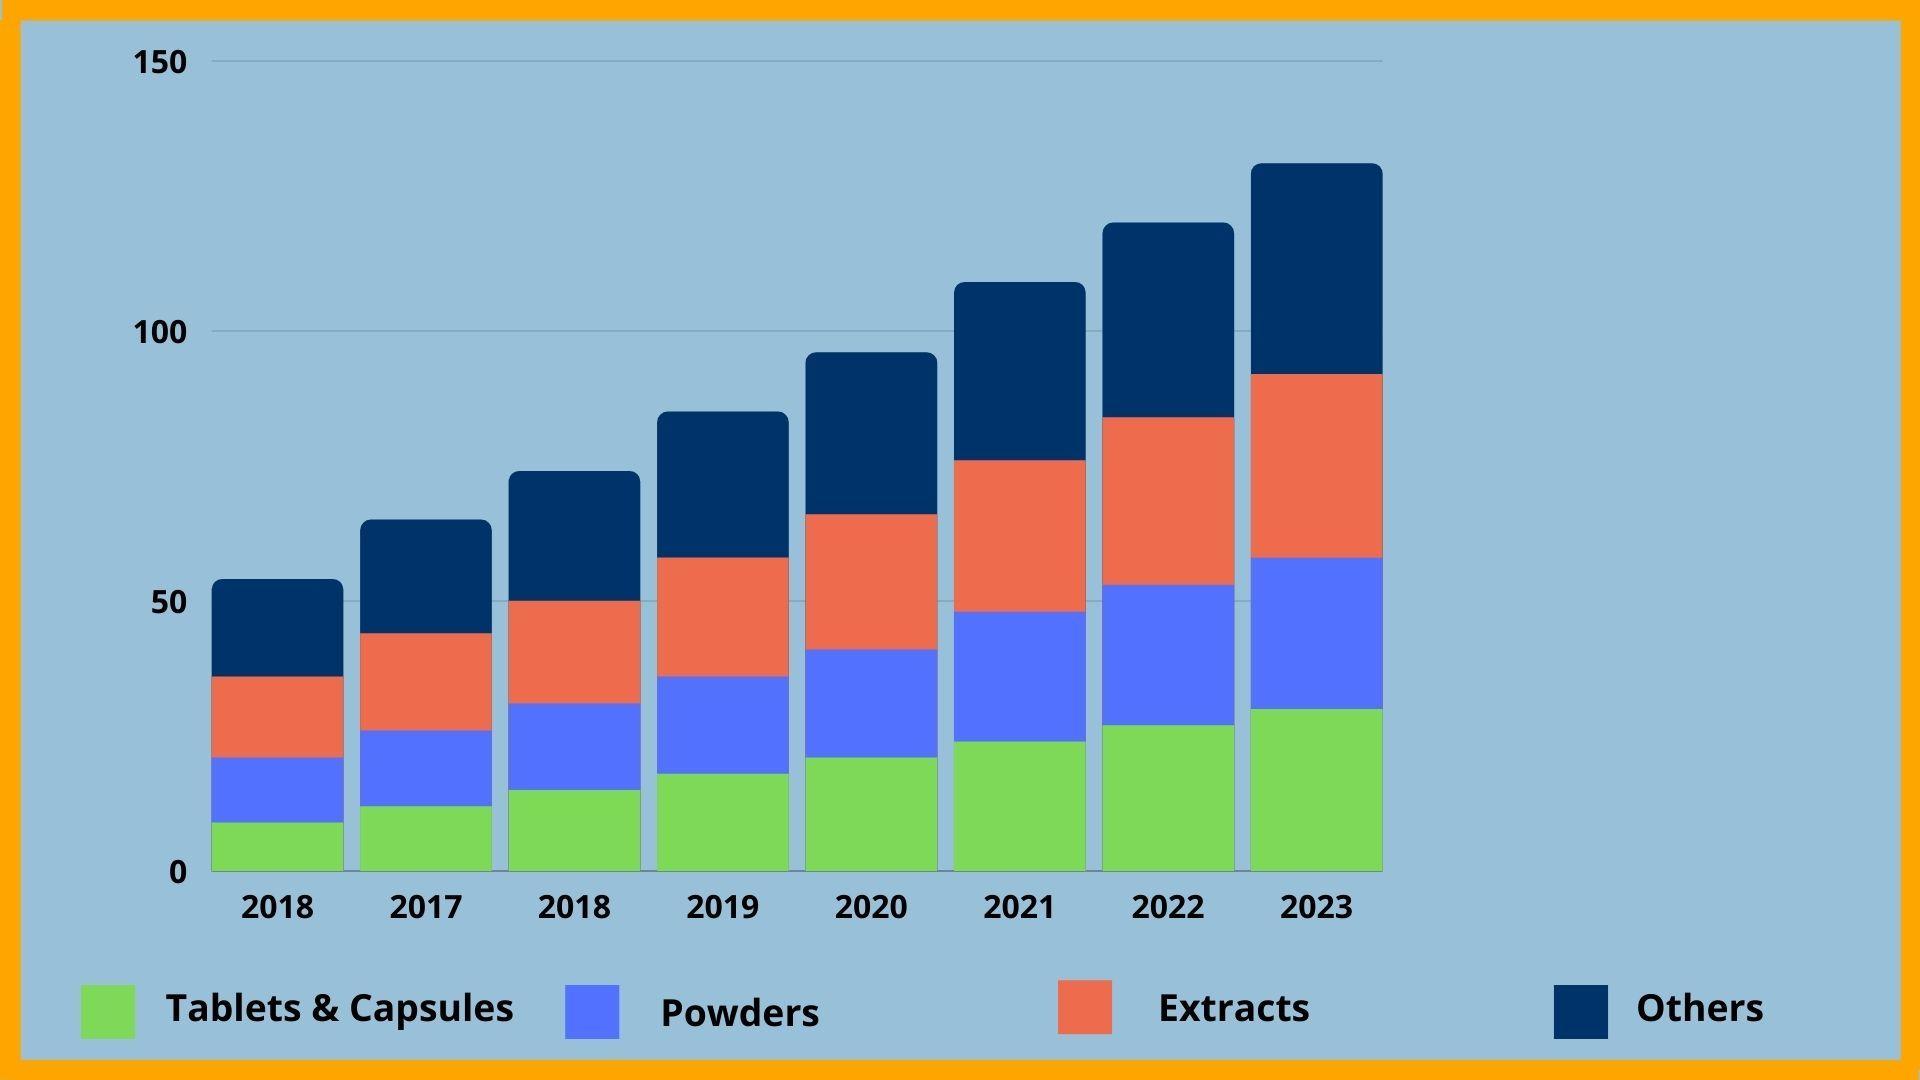 Global herbal medicine market revenue, by product